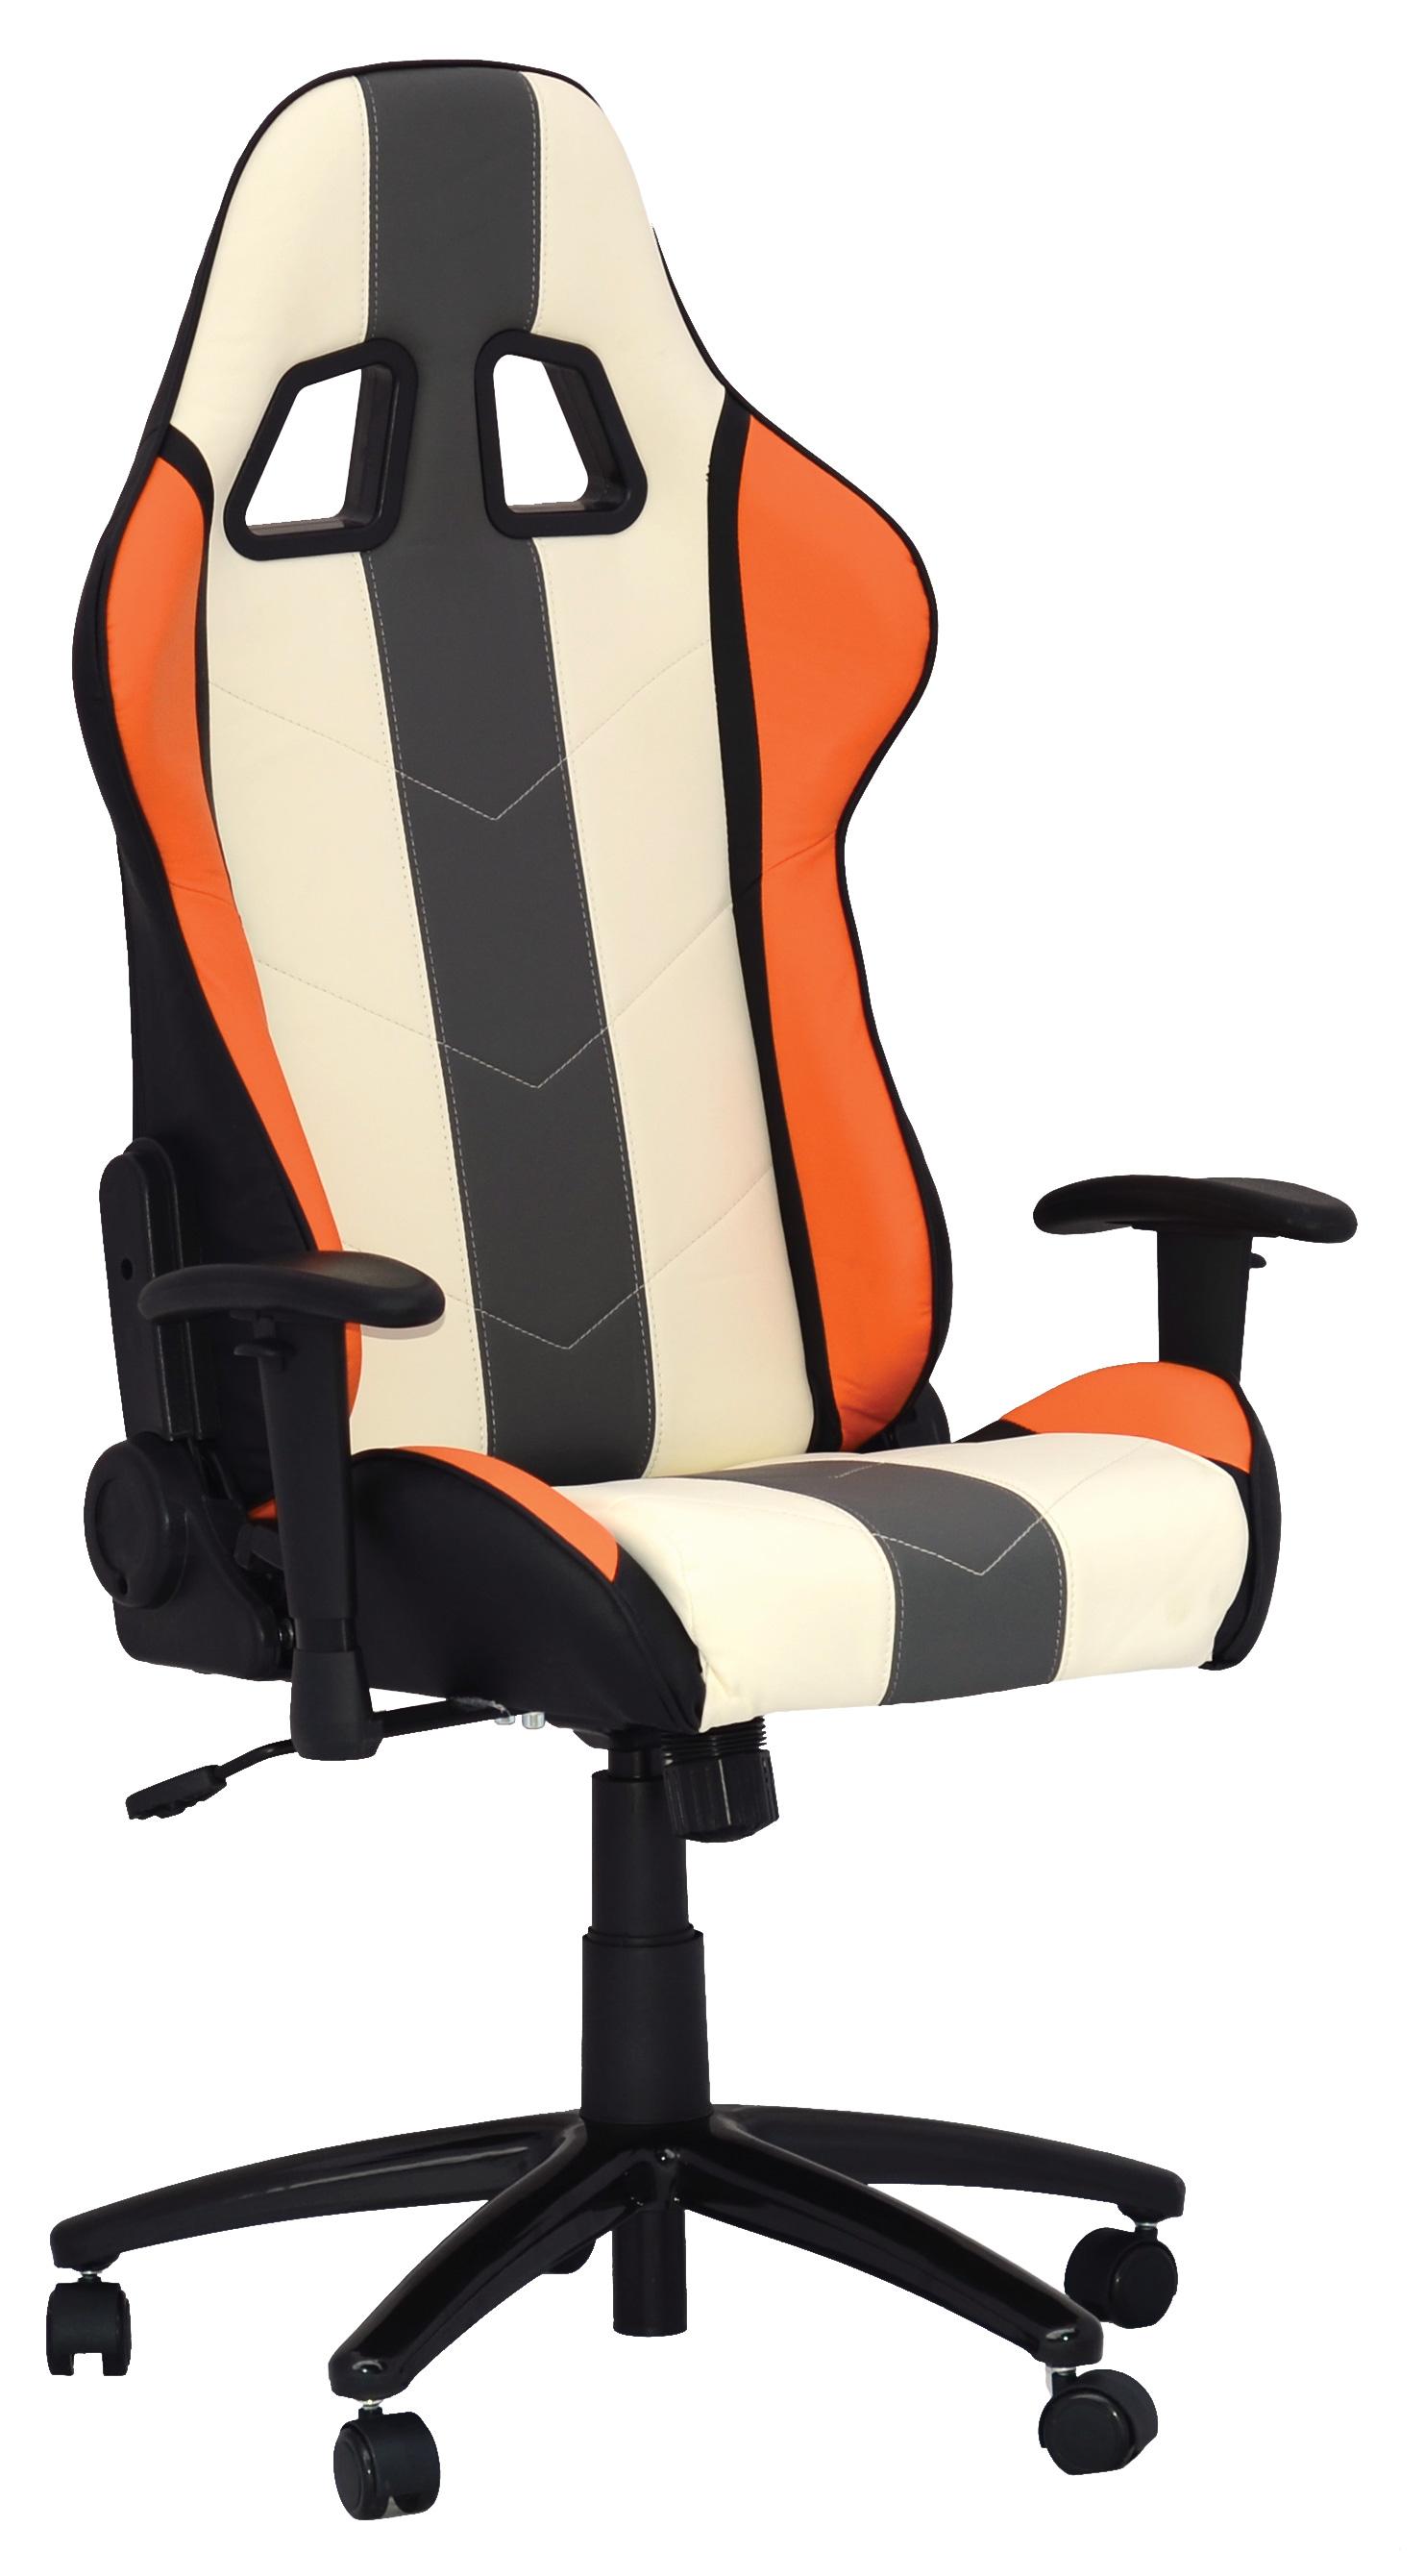 siege bureau blanc noir orange comptoir du tuning. Black Bedroom Furniture Sets. Home Design Ideas